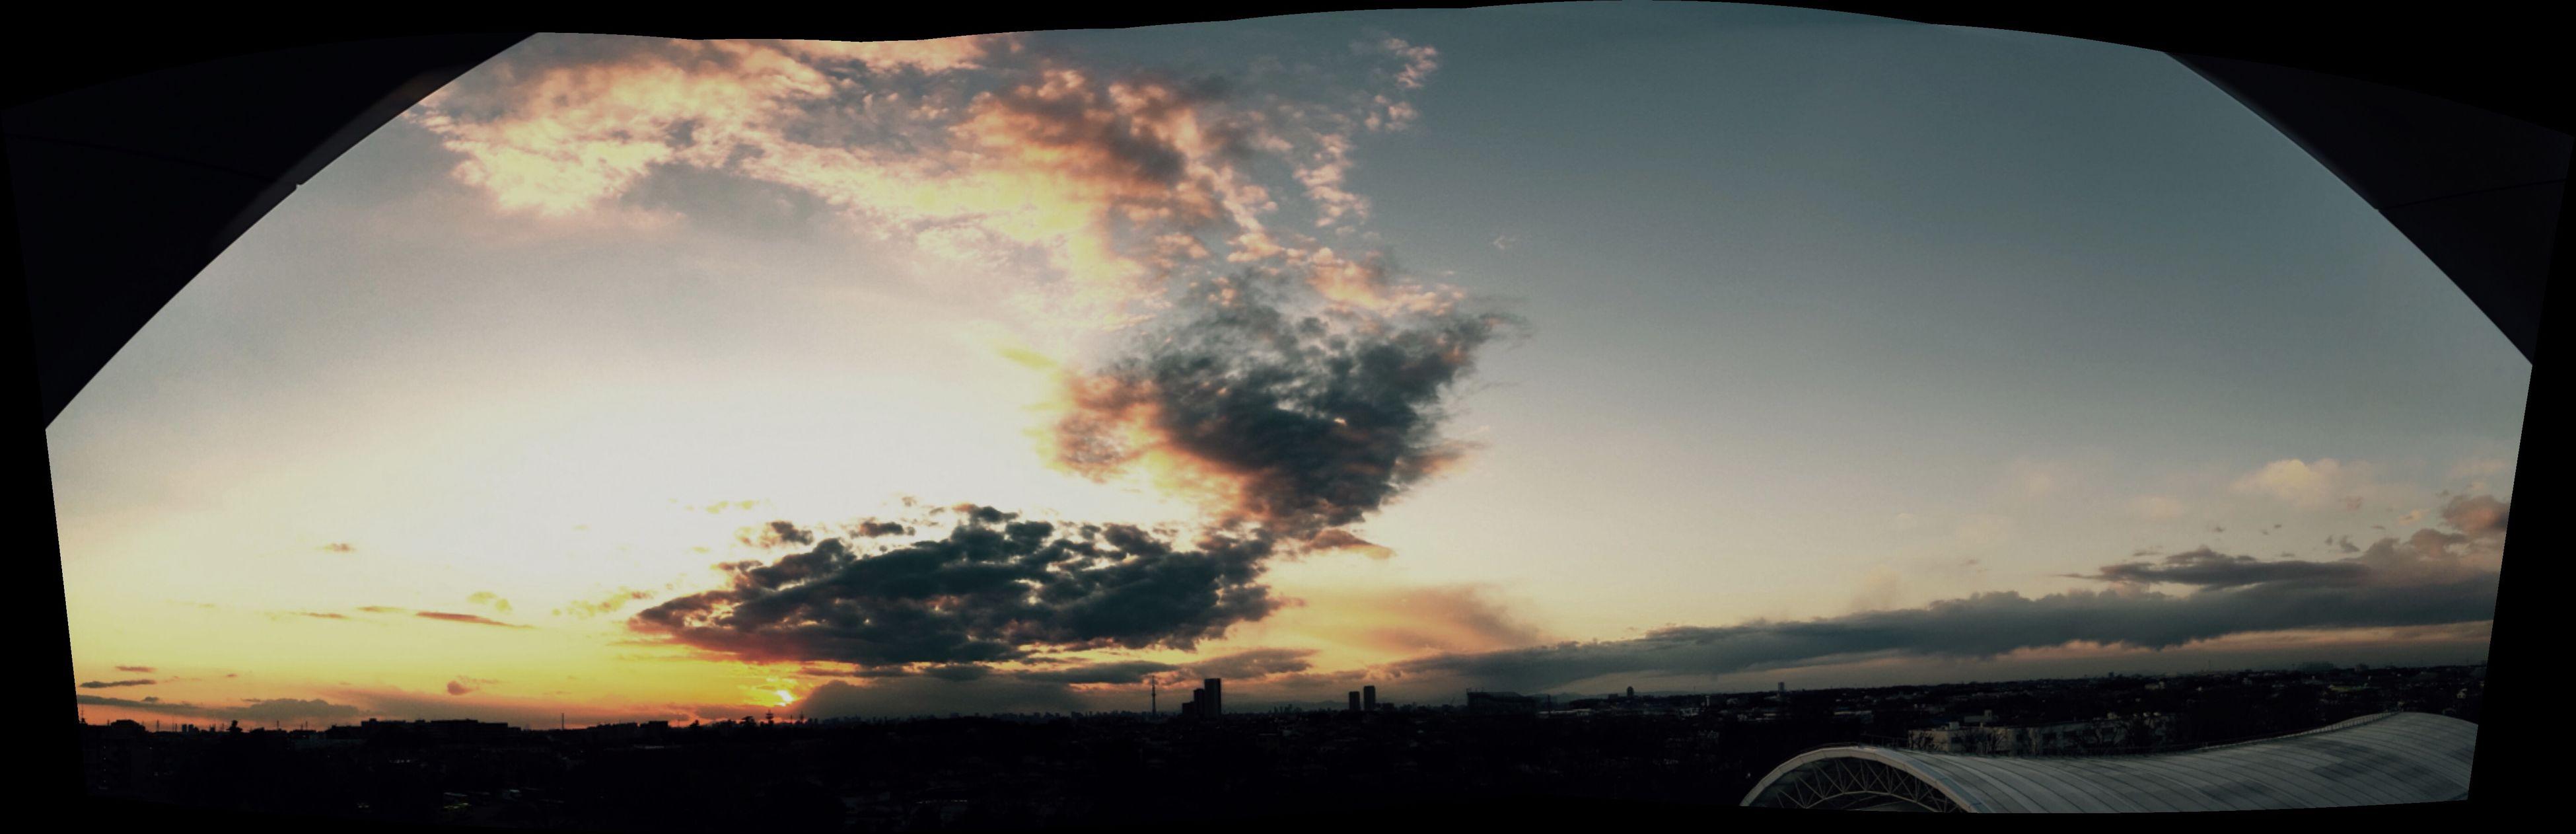 sky, sunset, cloud - sky, silhouette, beauty in nature, scenics, cloud, nature, cloudy, built structure, landscape, tranquil scene, architecture, tranquility, orange color, sun, dramatic sky, idyllic, weather, sunlight